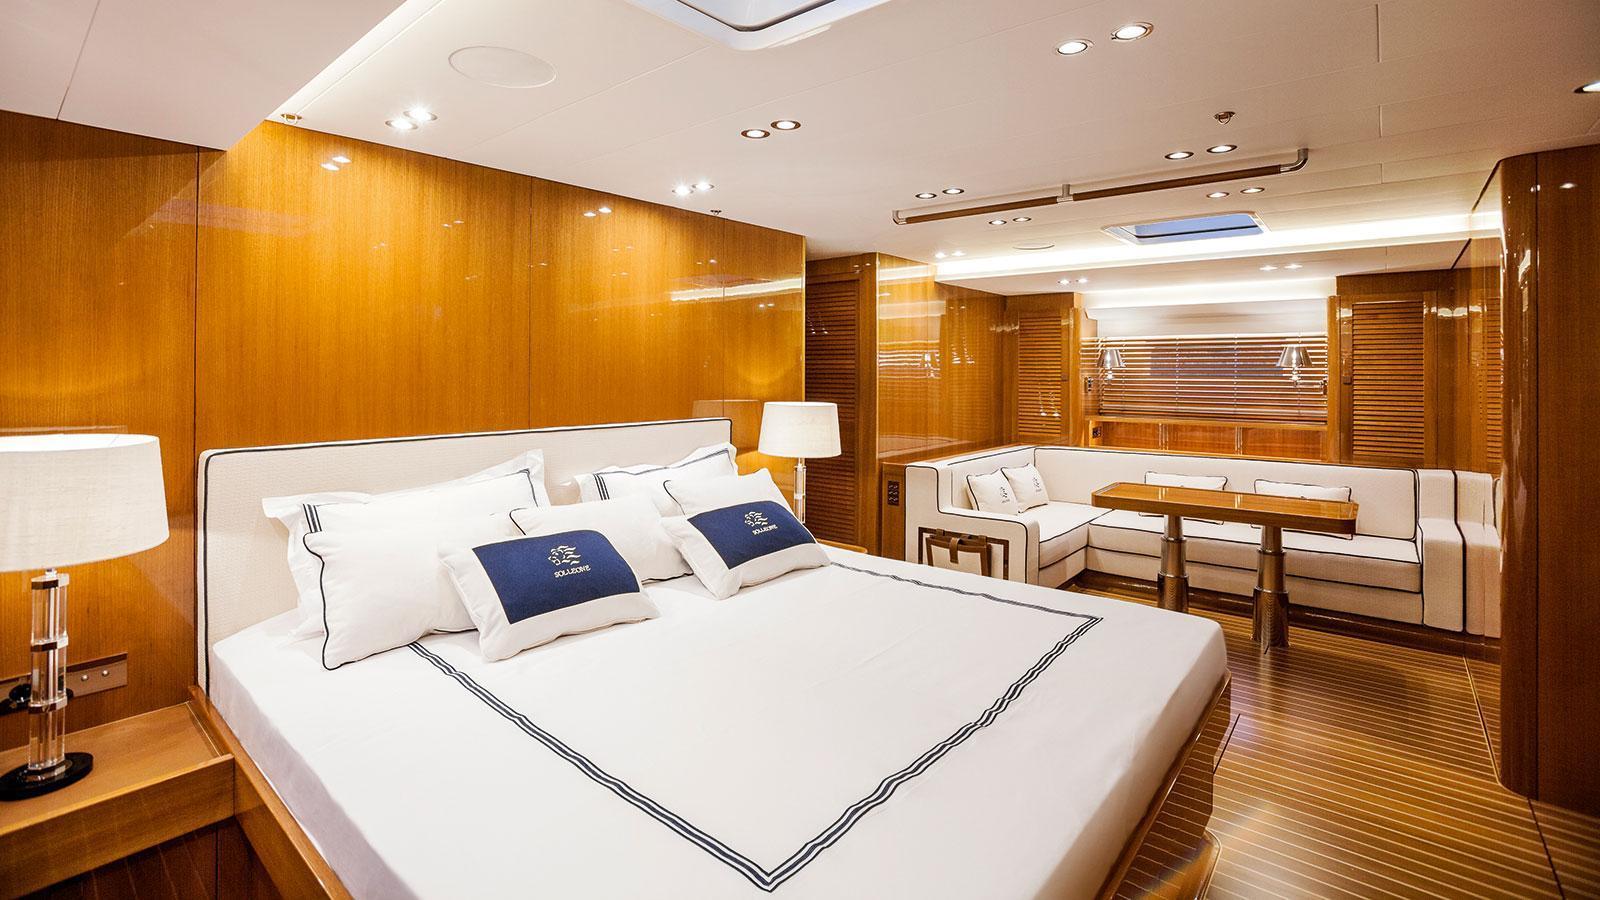 solleone-motor-yacht-nautors-swan-115-s-2015-35m-stateroom